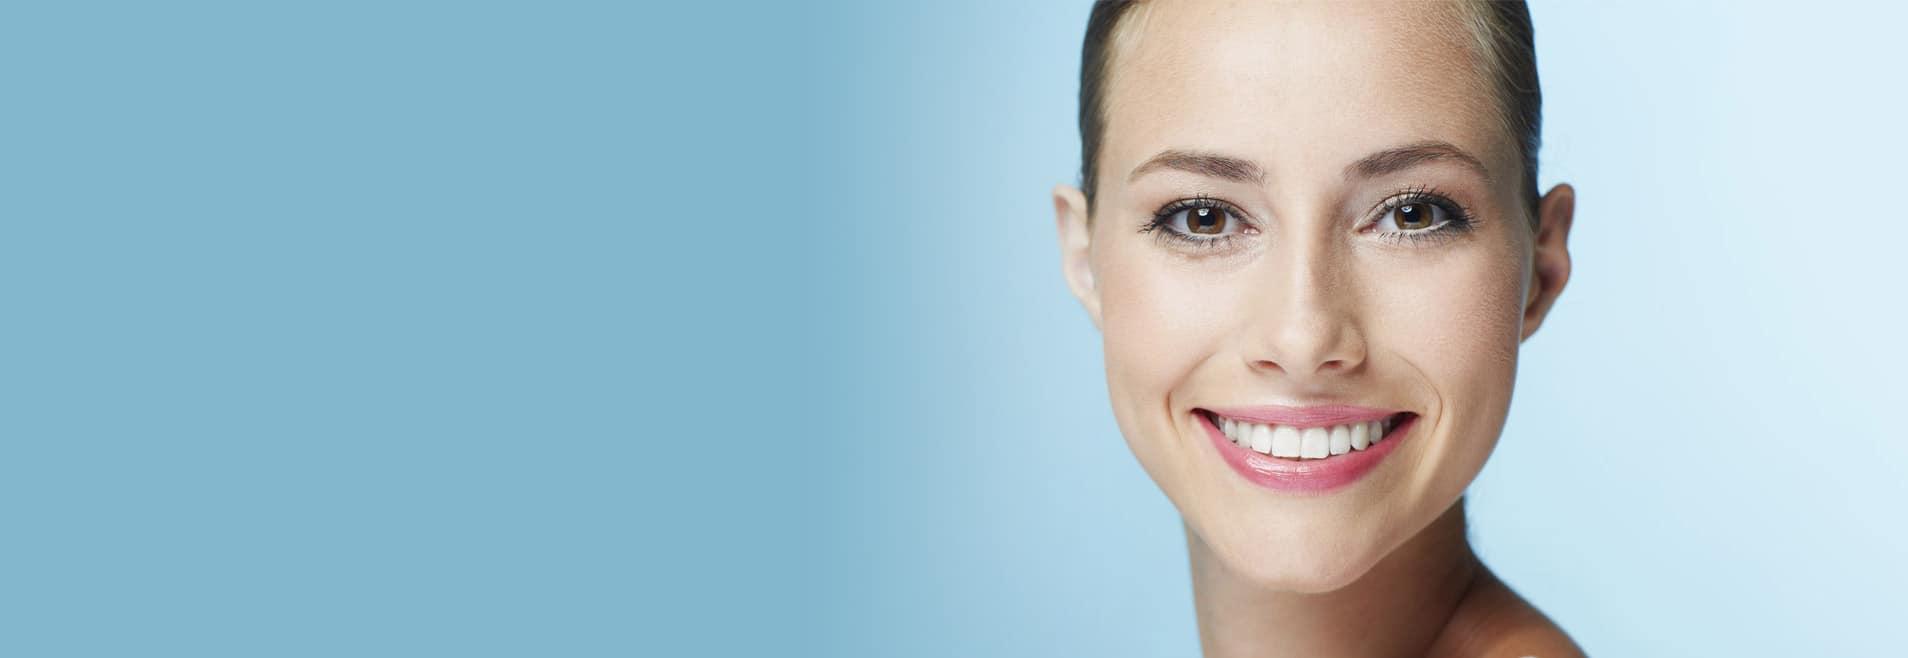 invisalign-dentist-chalfont-2016-3